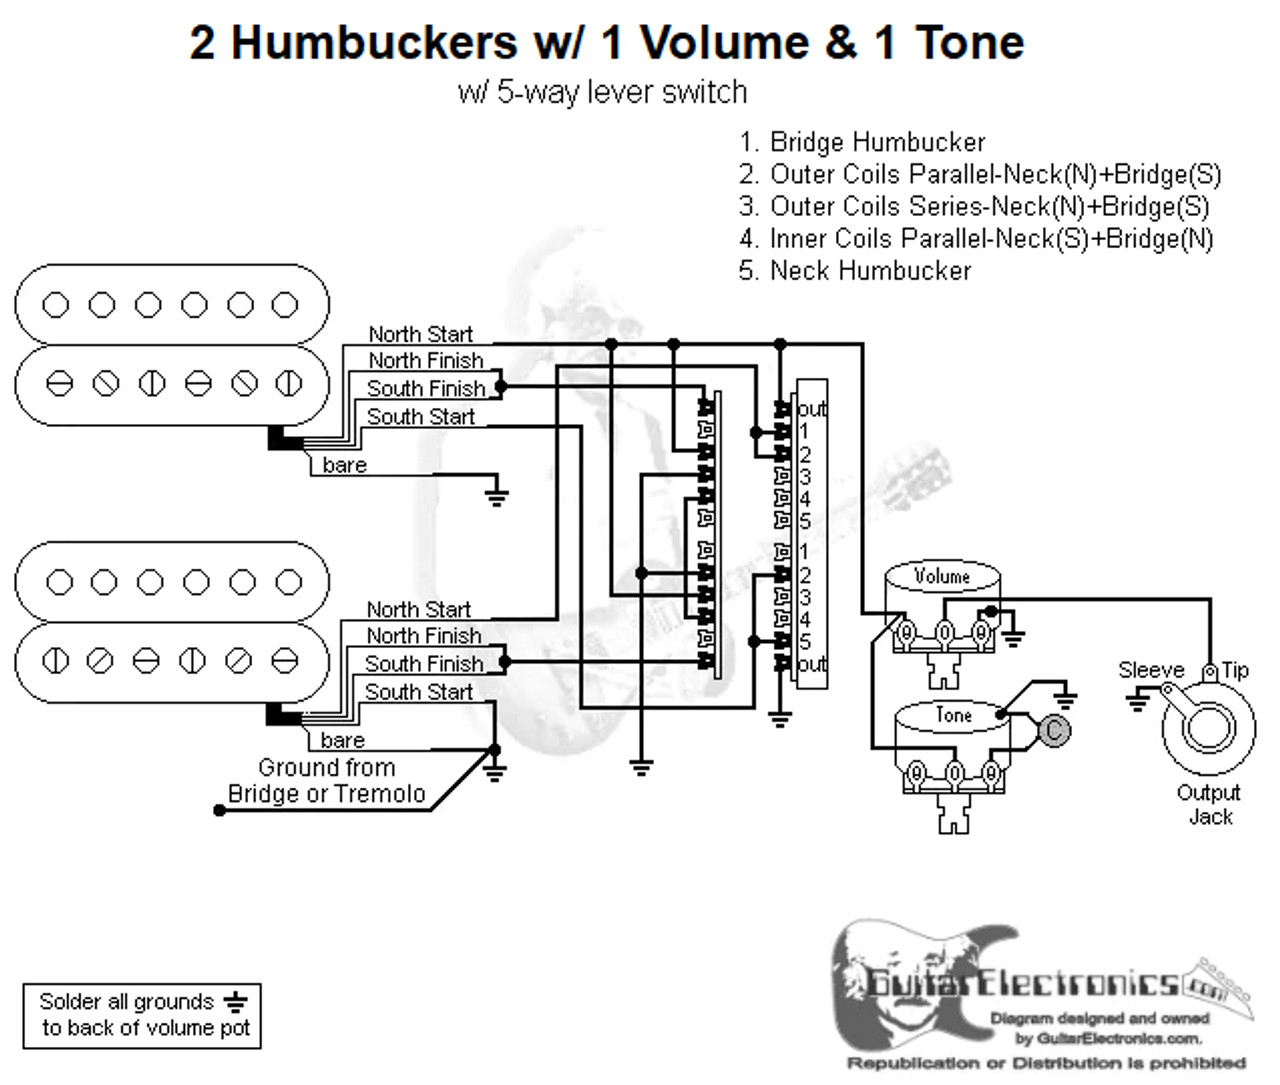 2 humbuckers 5 way lever switch 1 volume 1 tone 06 Fender 5 Way Switch Wiring Diagram 2 Humbuckers Fender 5 Way Switch Wiring Diagram 2 Humbuckers #10